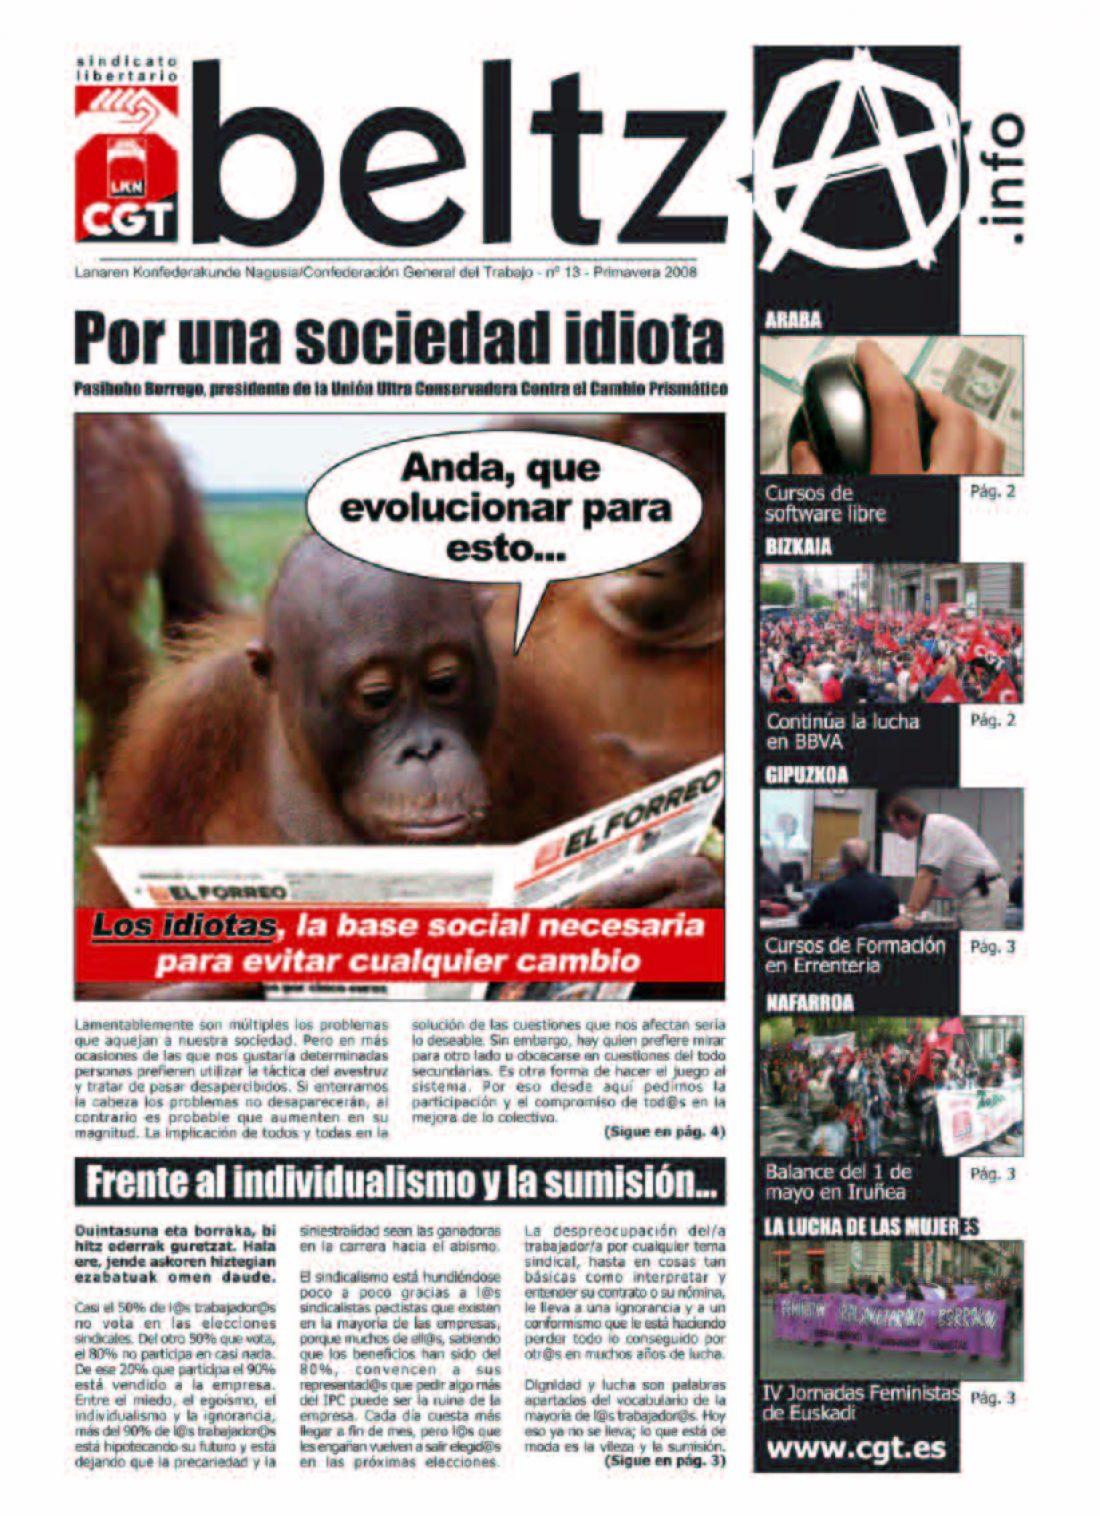 Beltza nº 13. Primavera 2008 (CGT Euskadi)